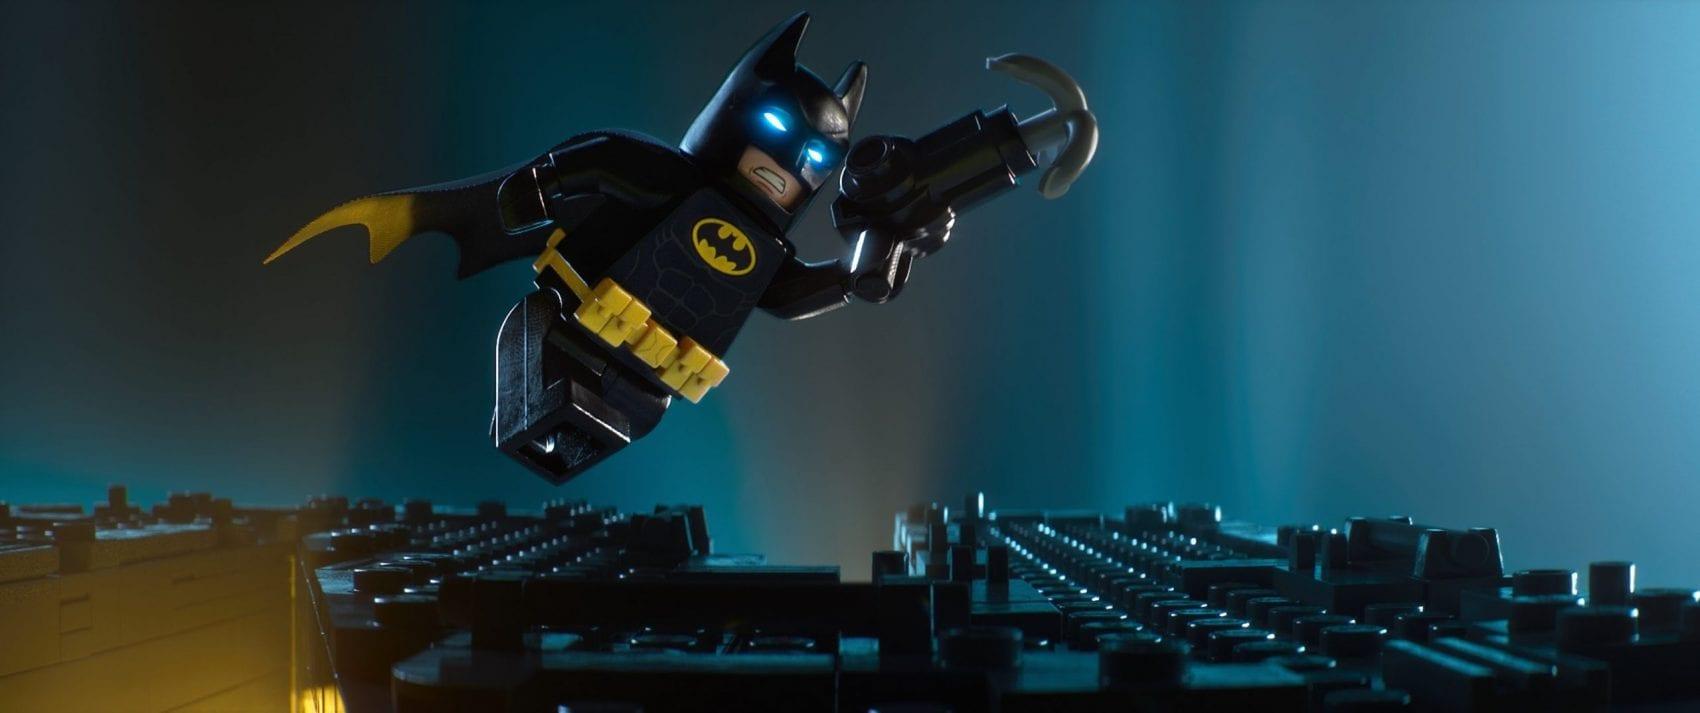 lego-batman-le-film-review-my-geek-actu-grappin